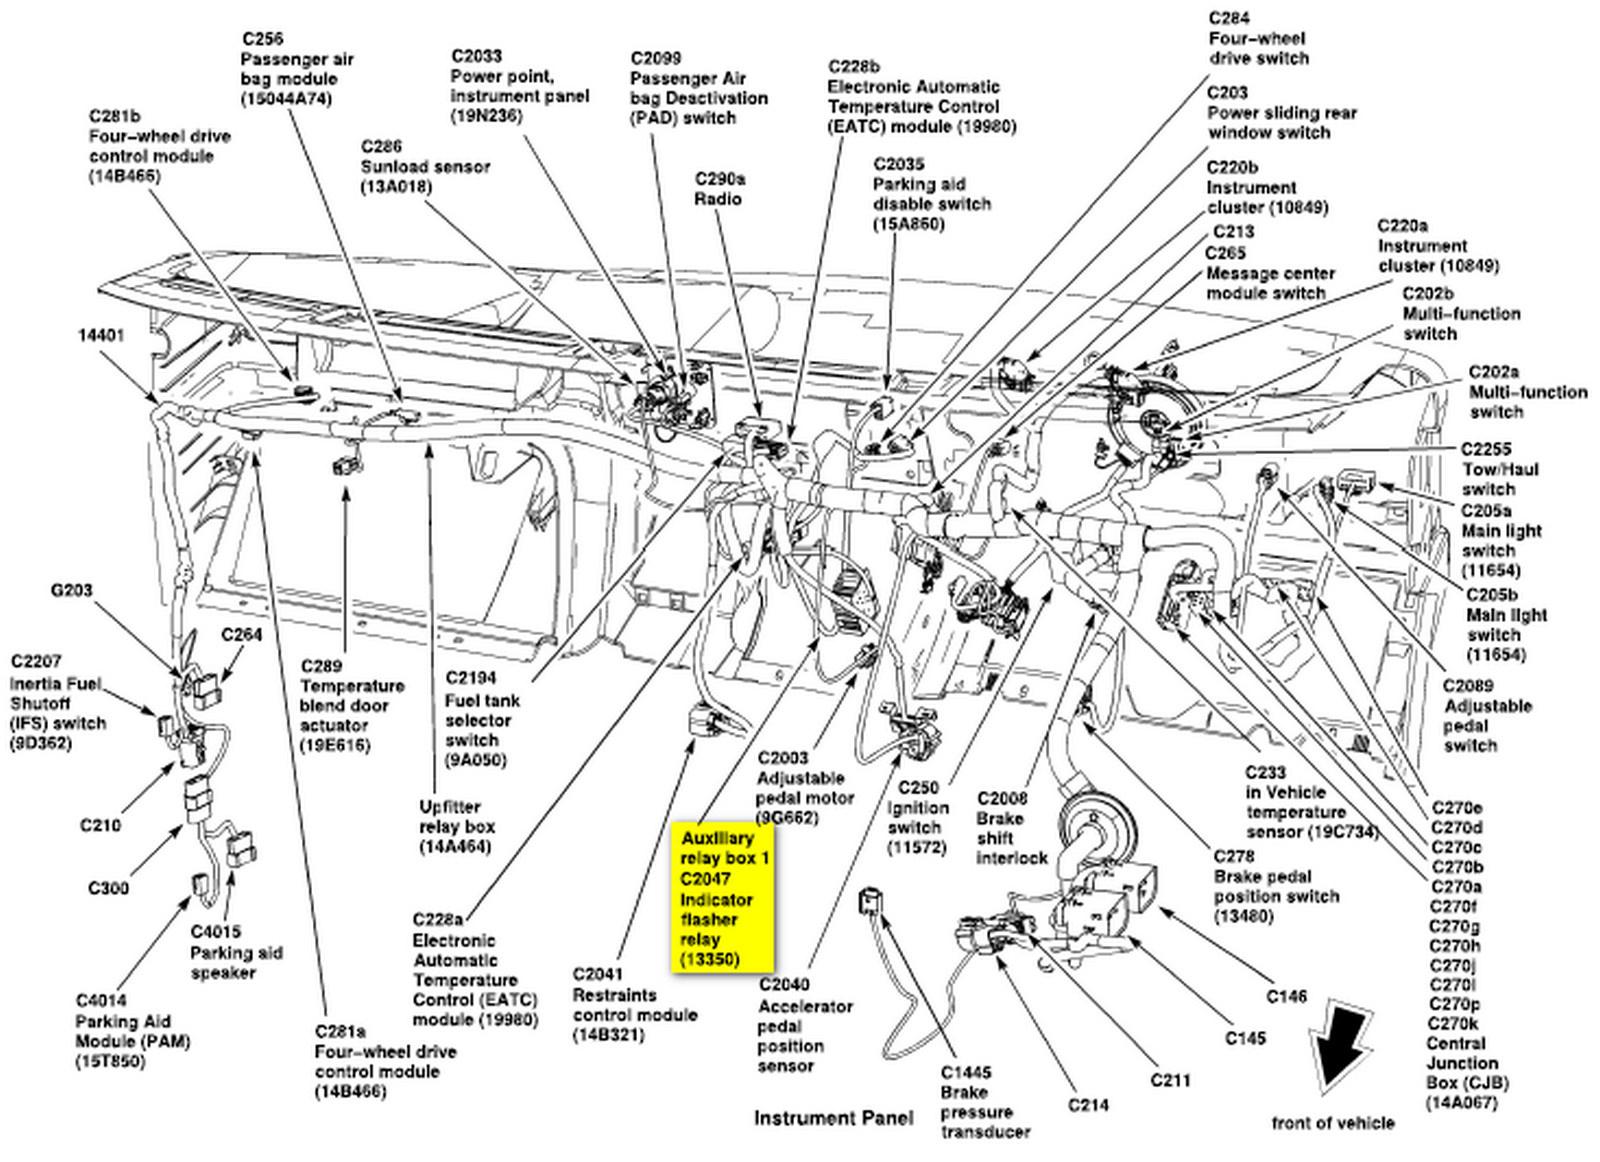 stereo wiring diagram for mazda mindjet alternative example of erd, Wiring diagram